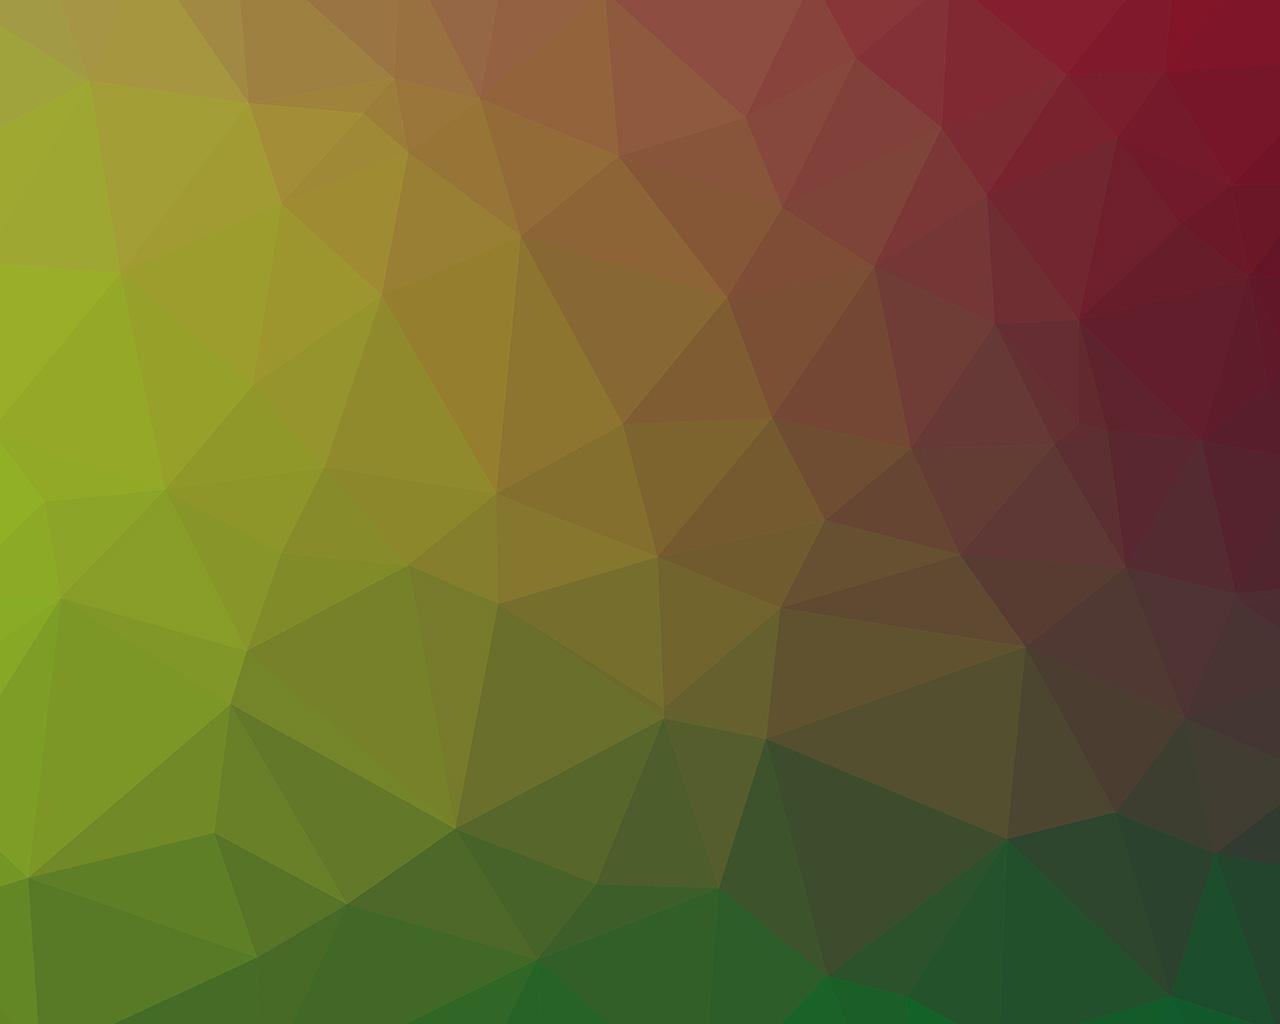 Ios 7 Hd Wallpaper Download Wallpaper For Desktop Laptop Vk68 Samsung Galaxy